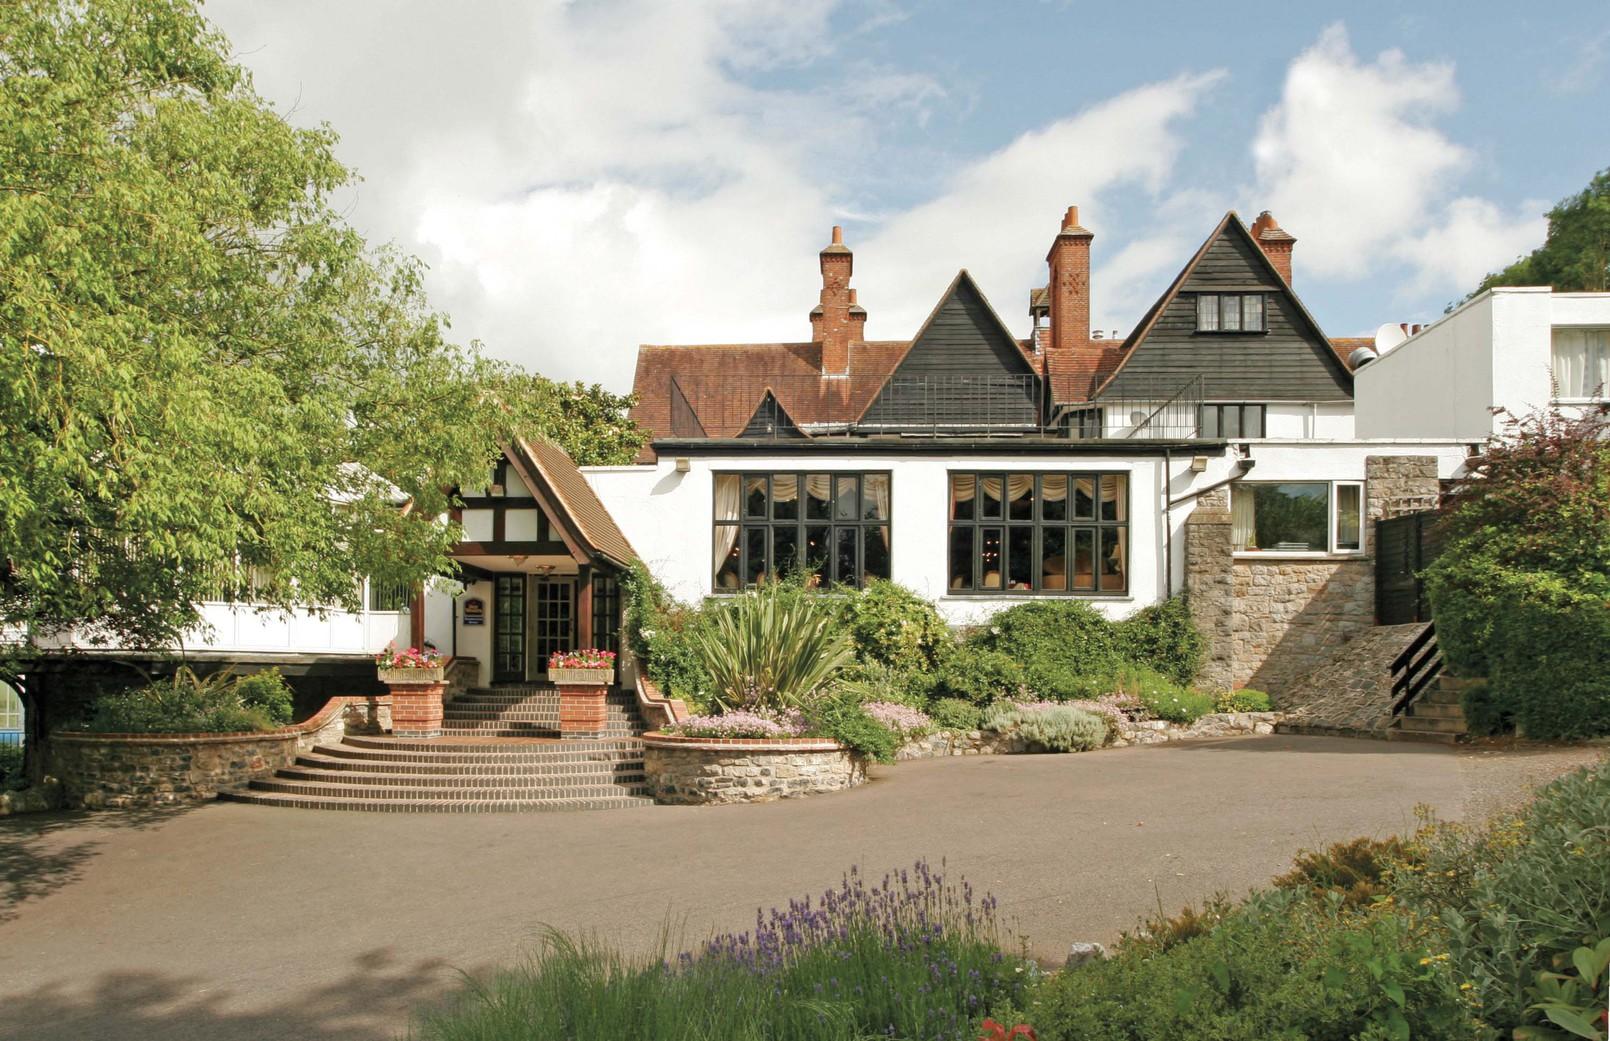 Webbington Hotel and Spa for hire